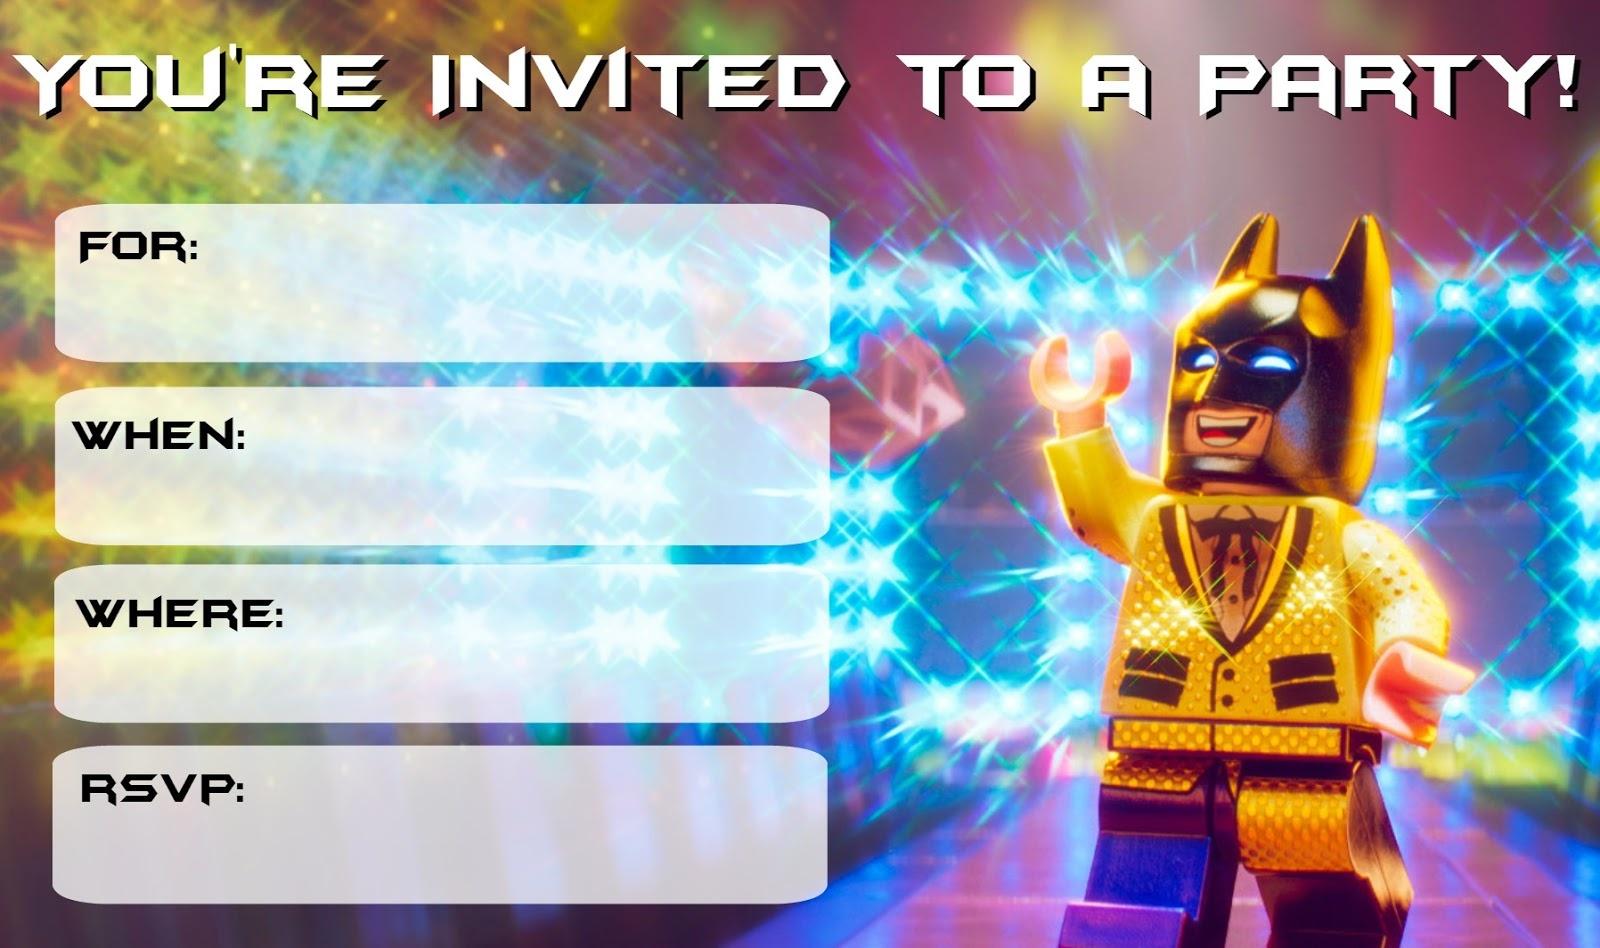 Musings Of An Average Mom: Lego Batman Movie Party Invitations - Lego Batman Invitations Free Printable